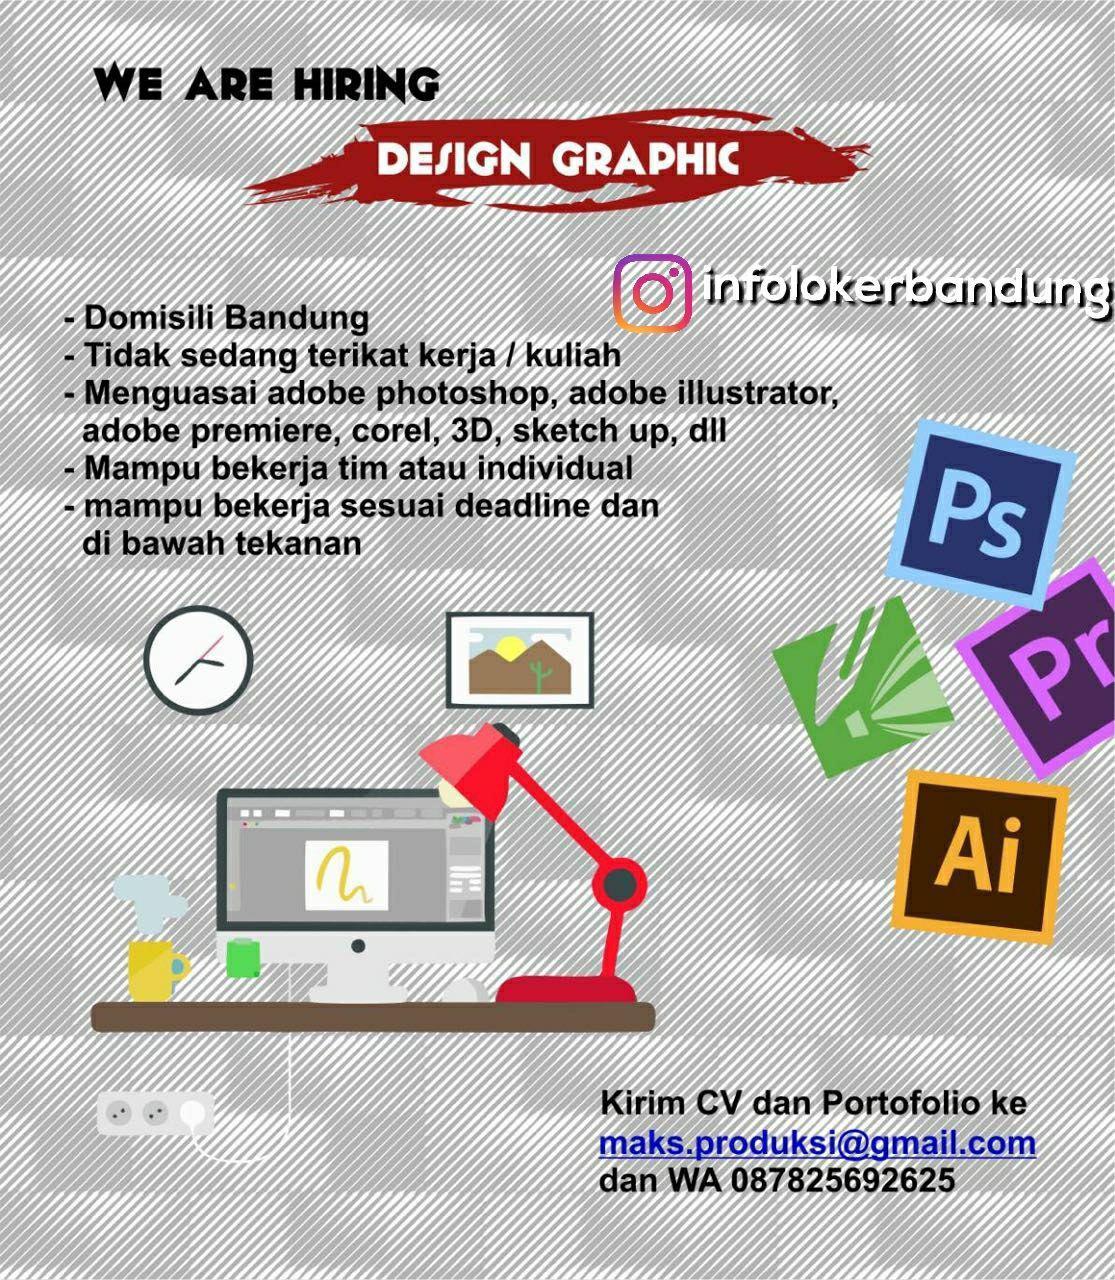 Lowongan Kerja Design Graphic MAKS.Co Event Organizer Bandung Desember 2017